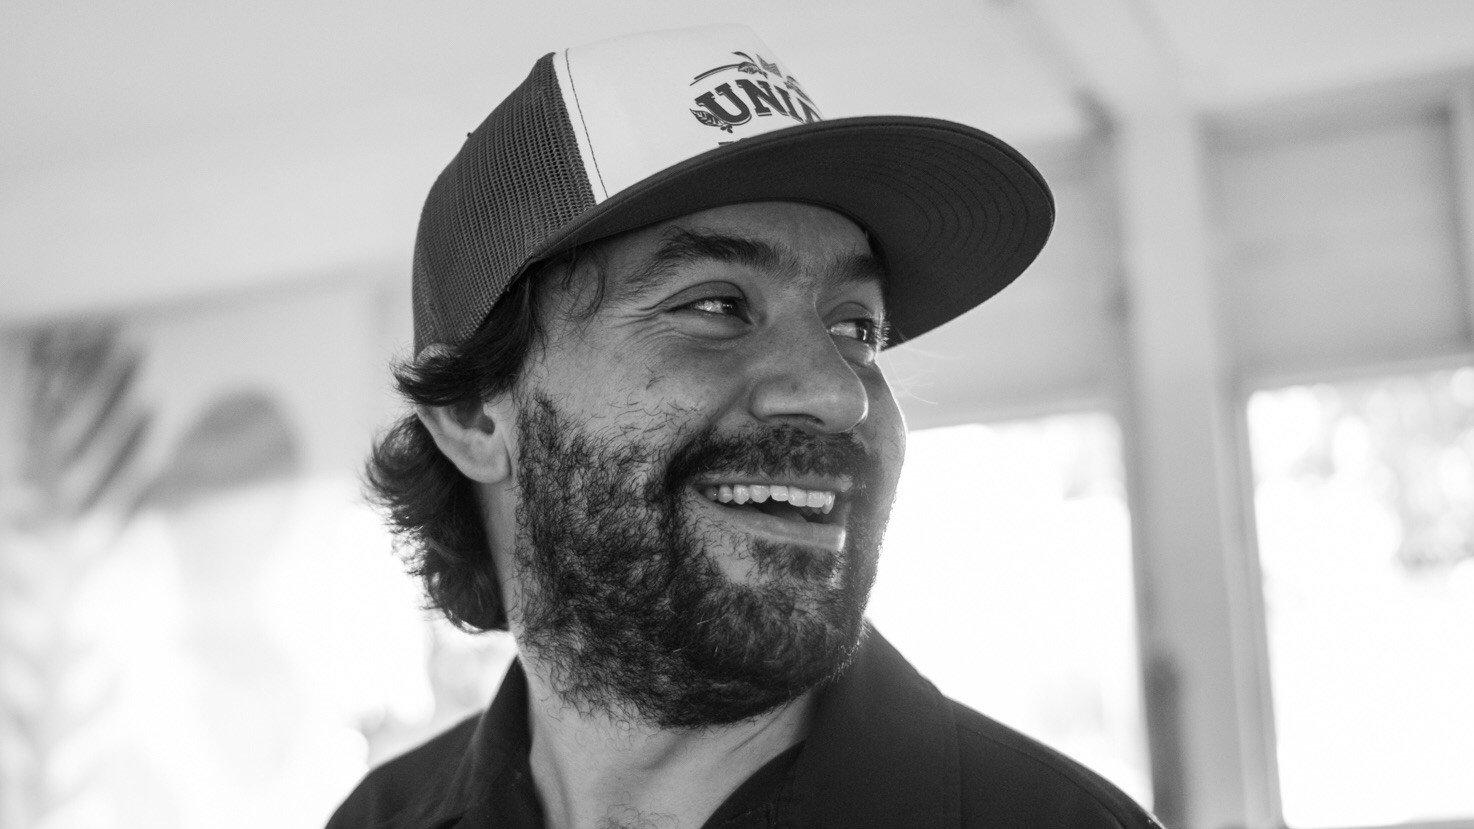 Mario Castrellon Chef-Owner at Restaurante Maito